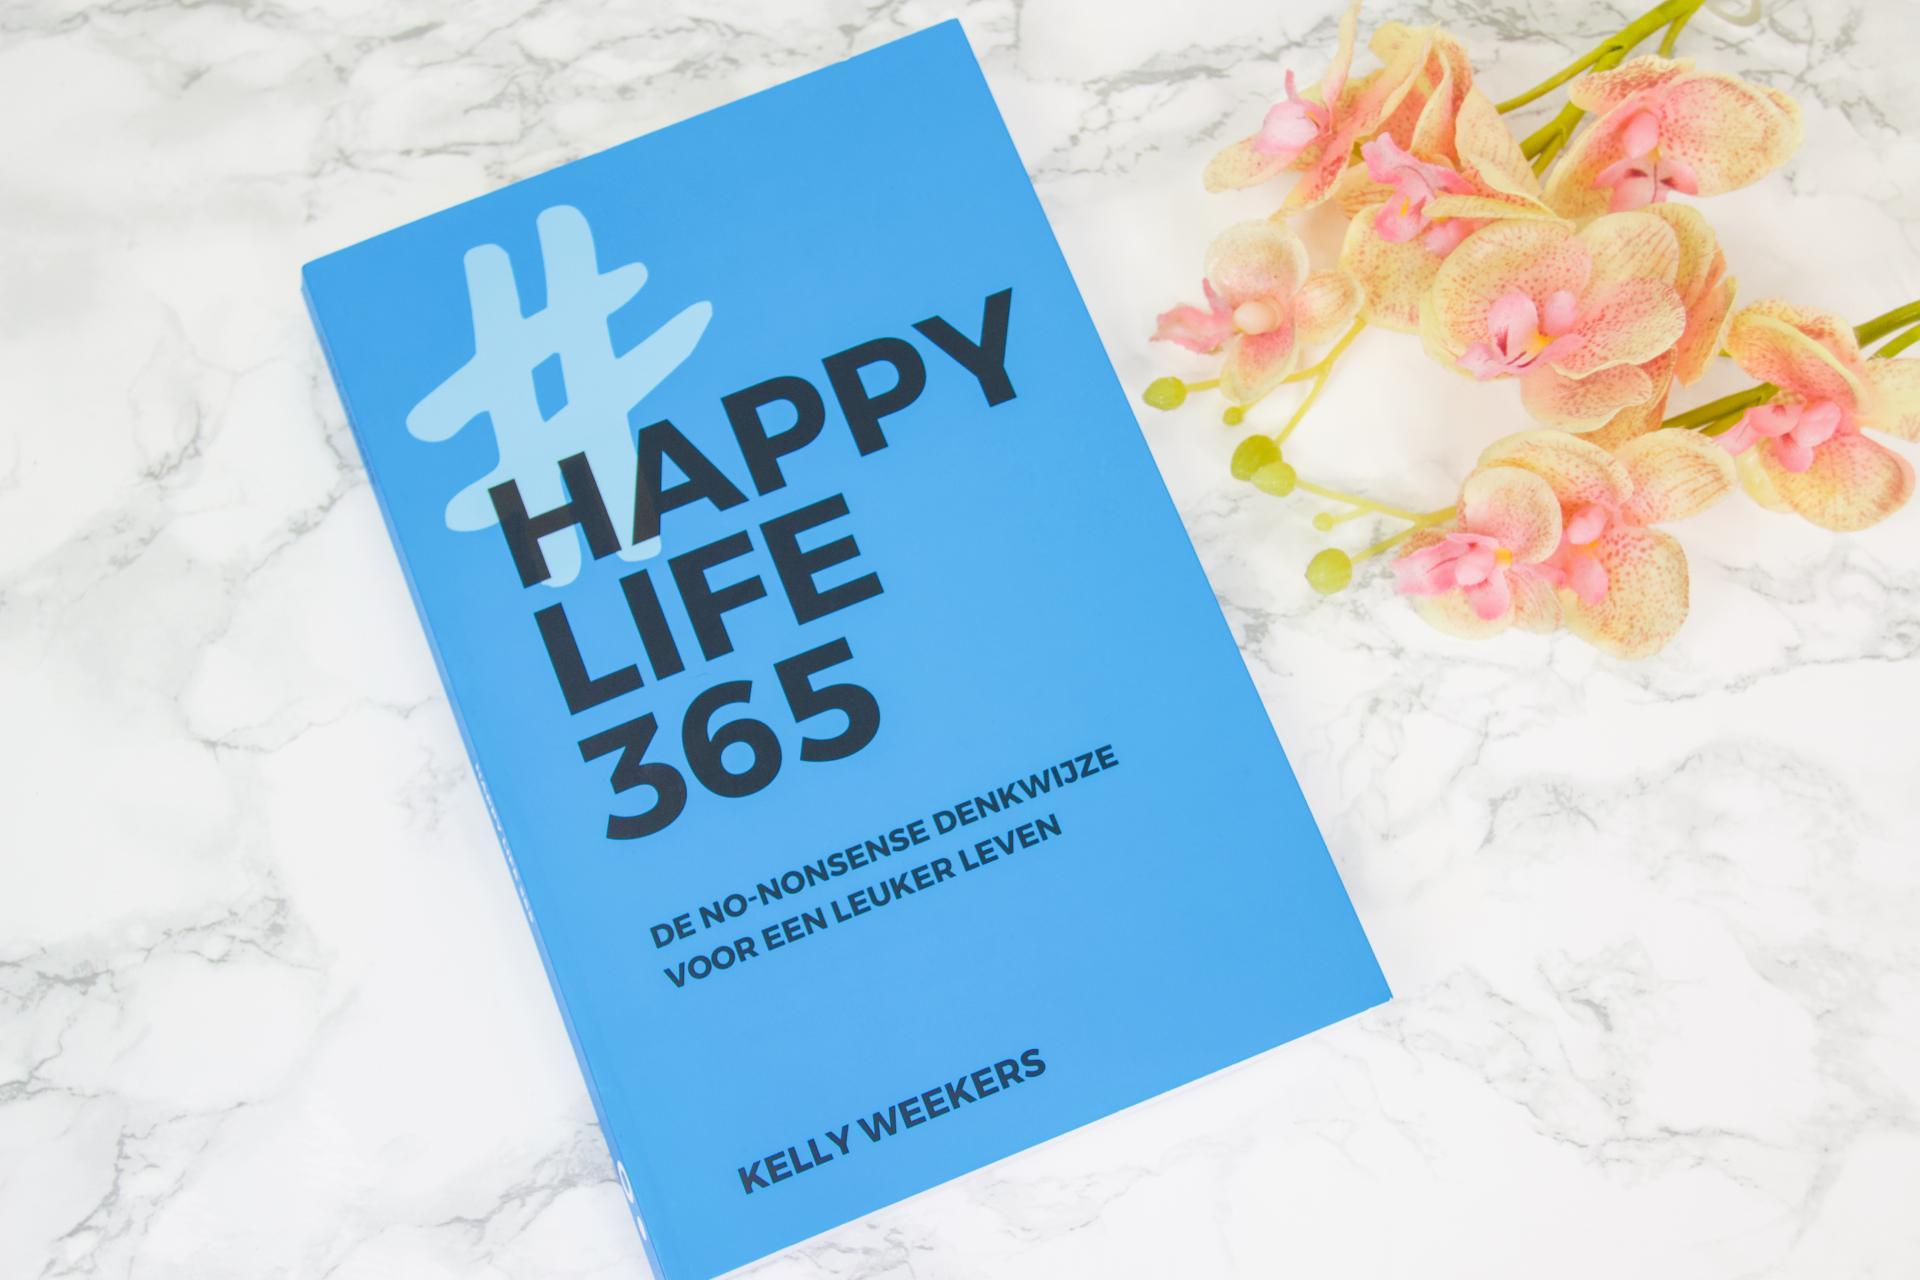 Happy Life 365 Boek omslag